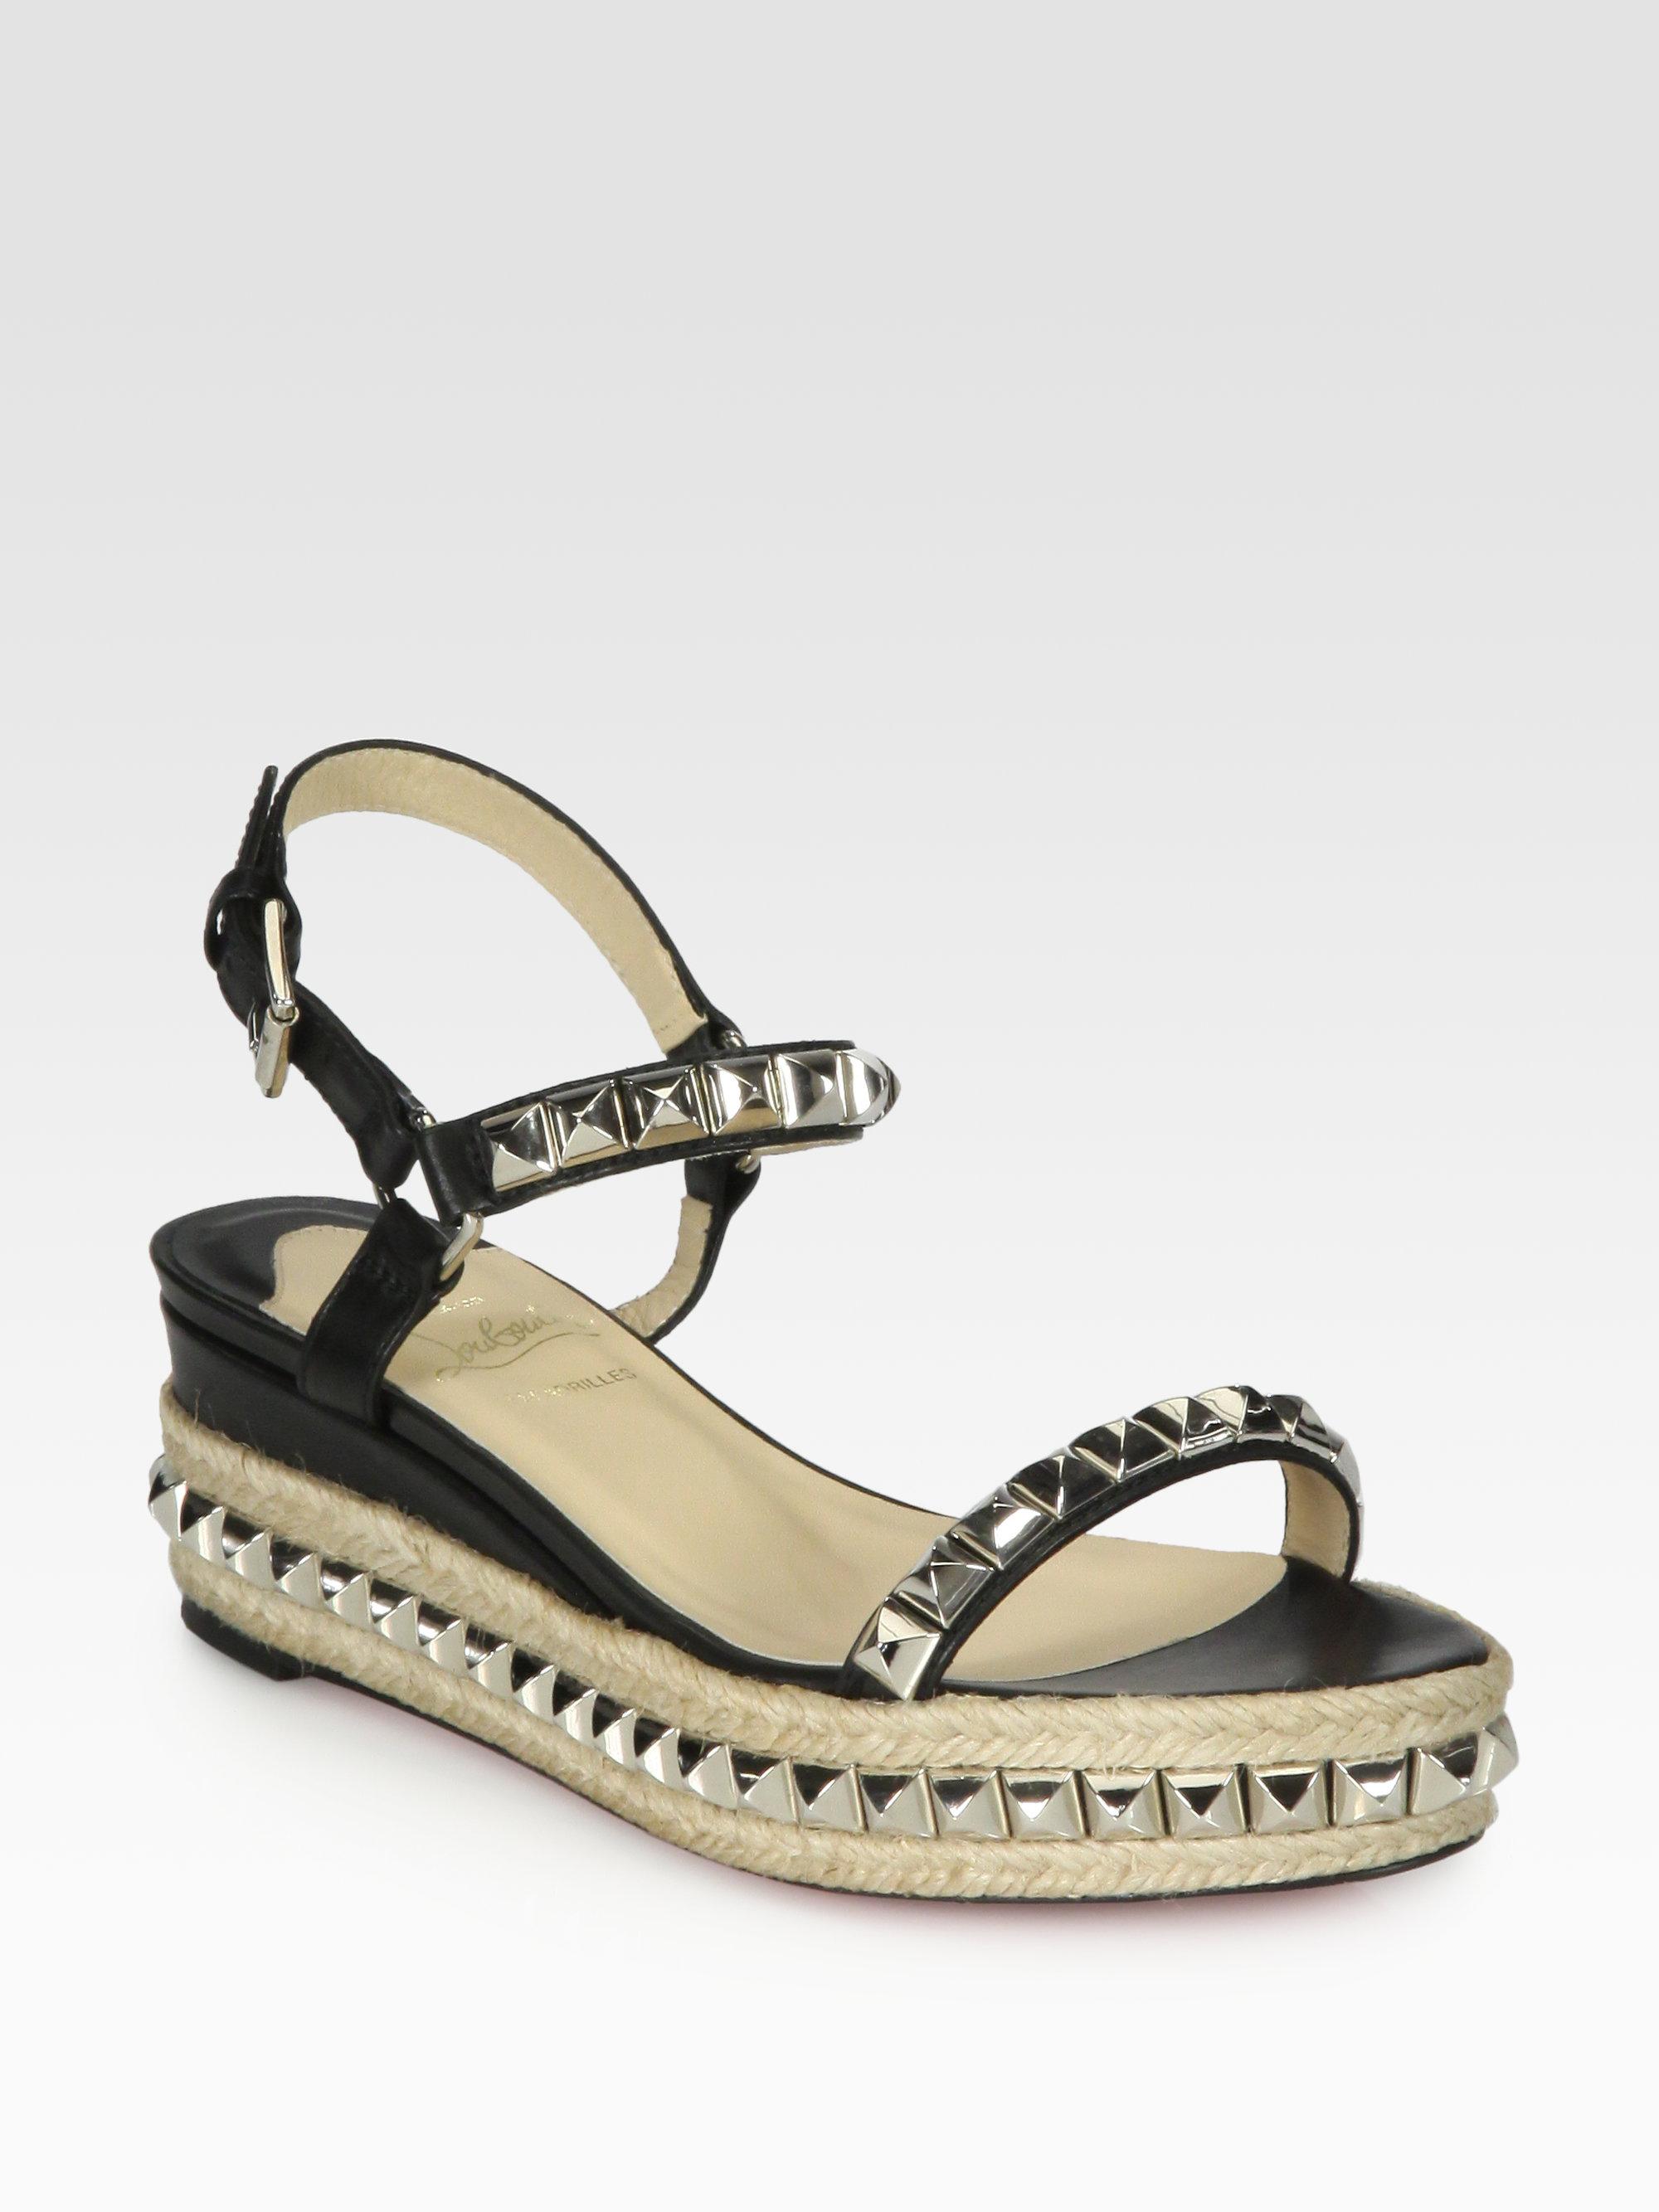 Christian Louboutin Wedge Shoes Sale